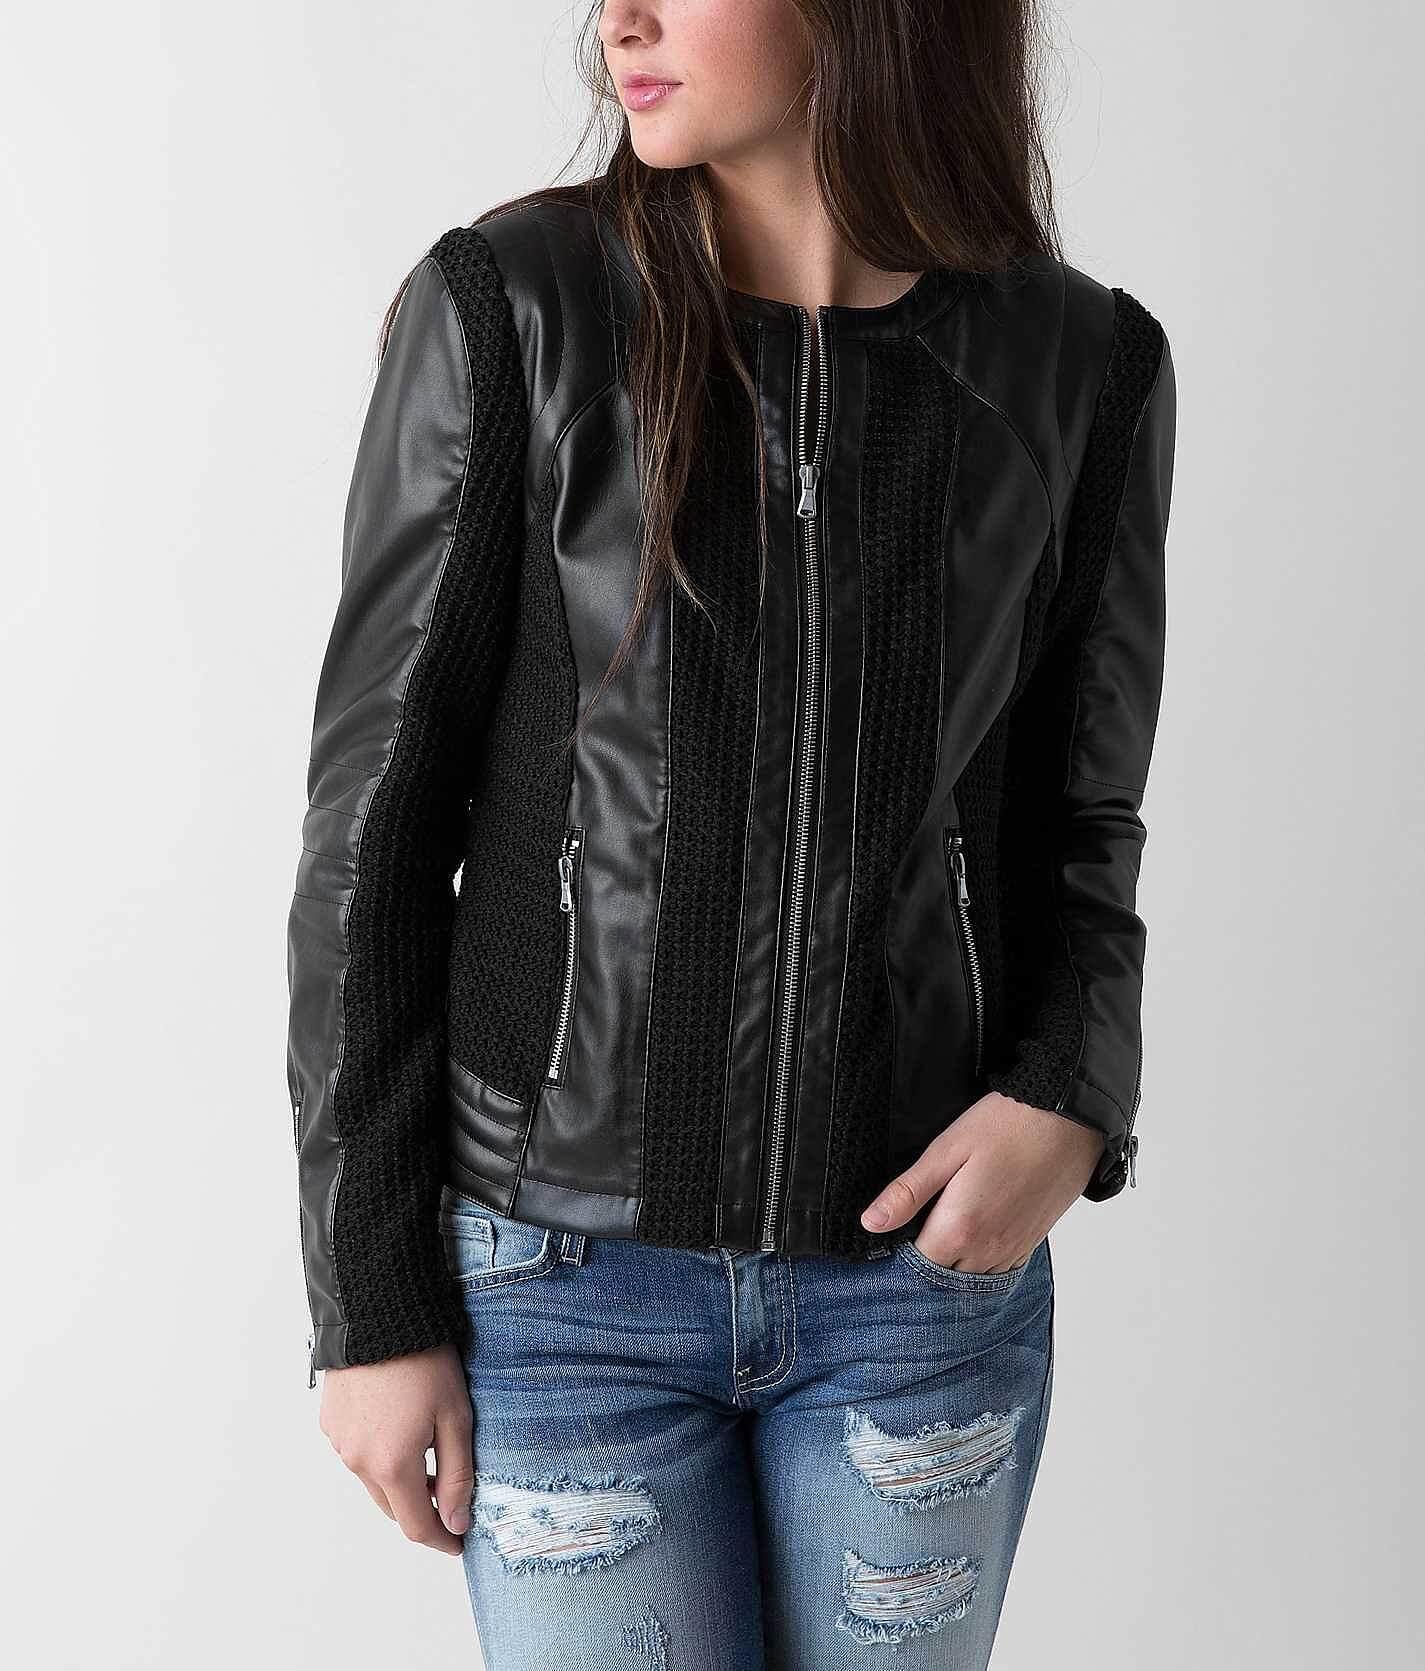 Blanc noir jacket leather